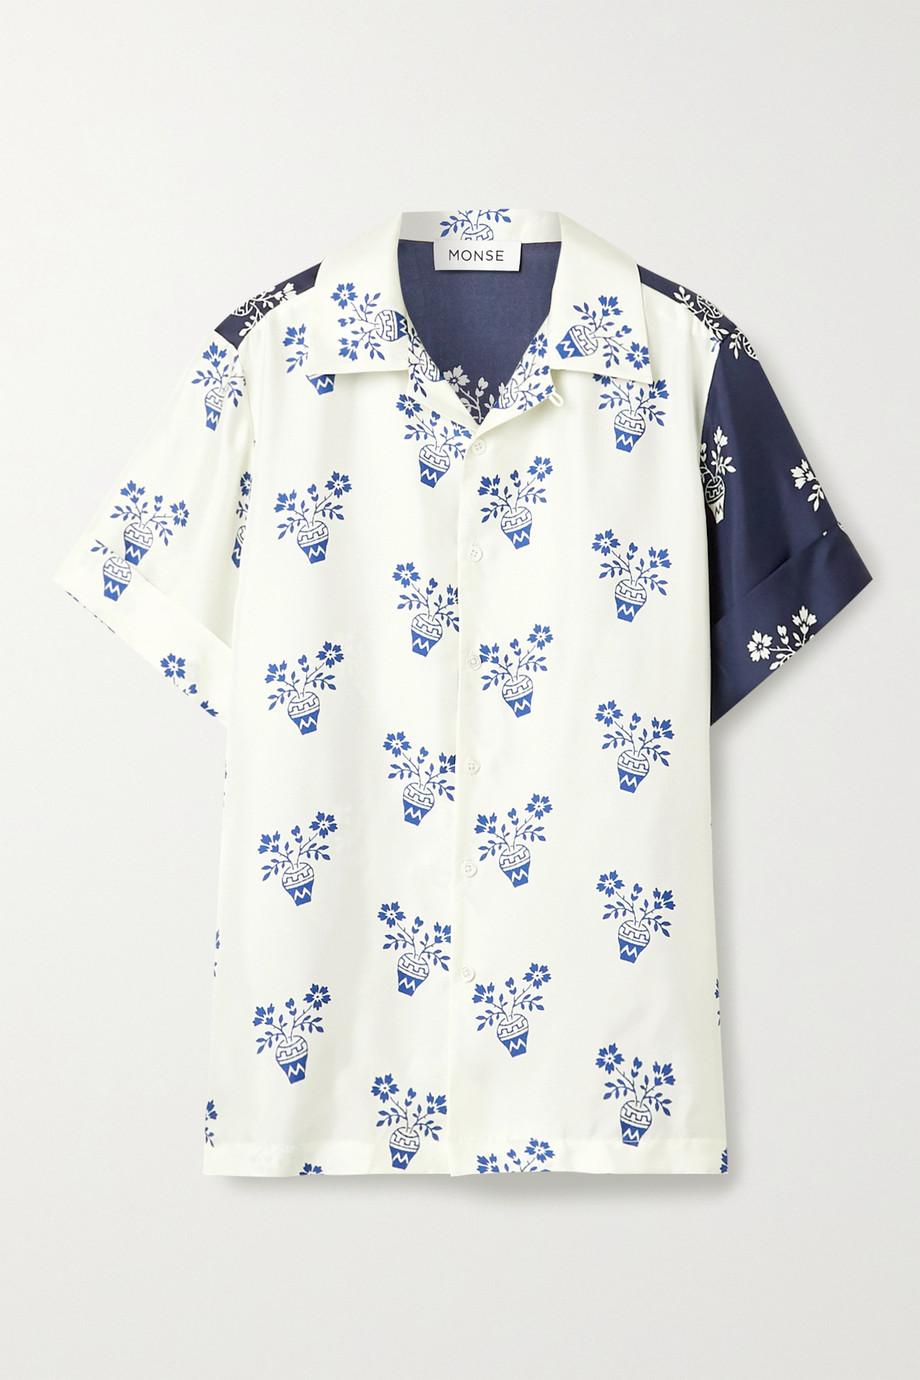 Monse Flower Pot paneled printed silk-twill shirt